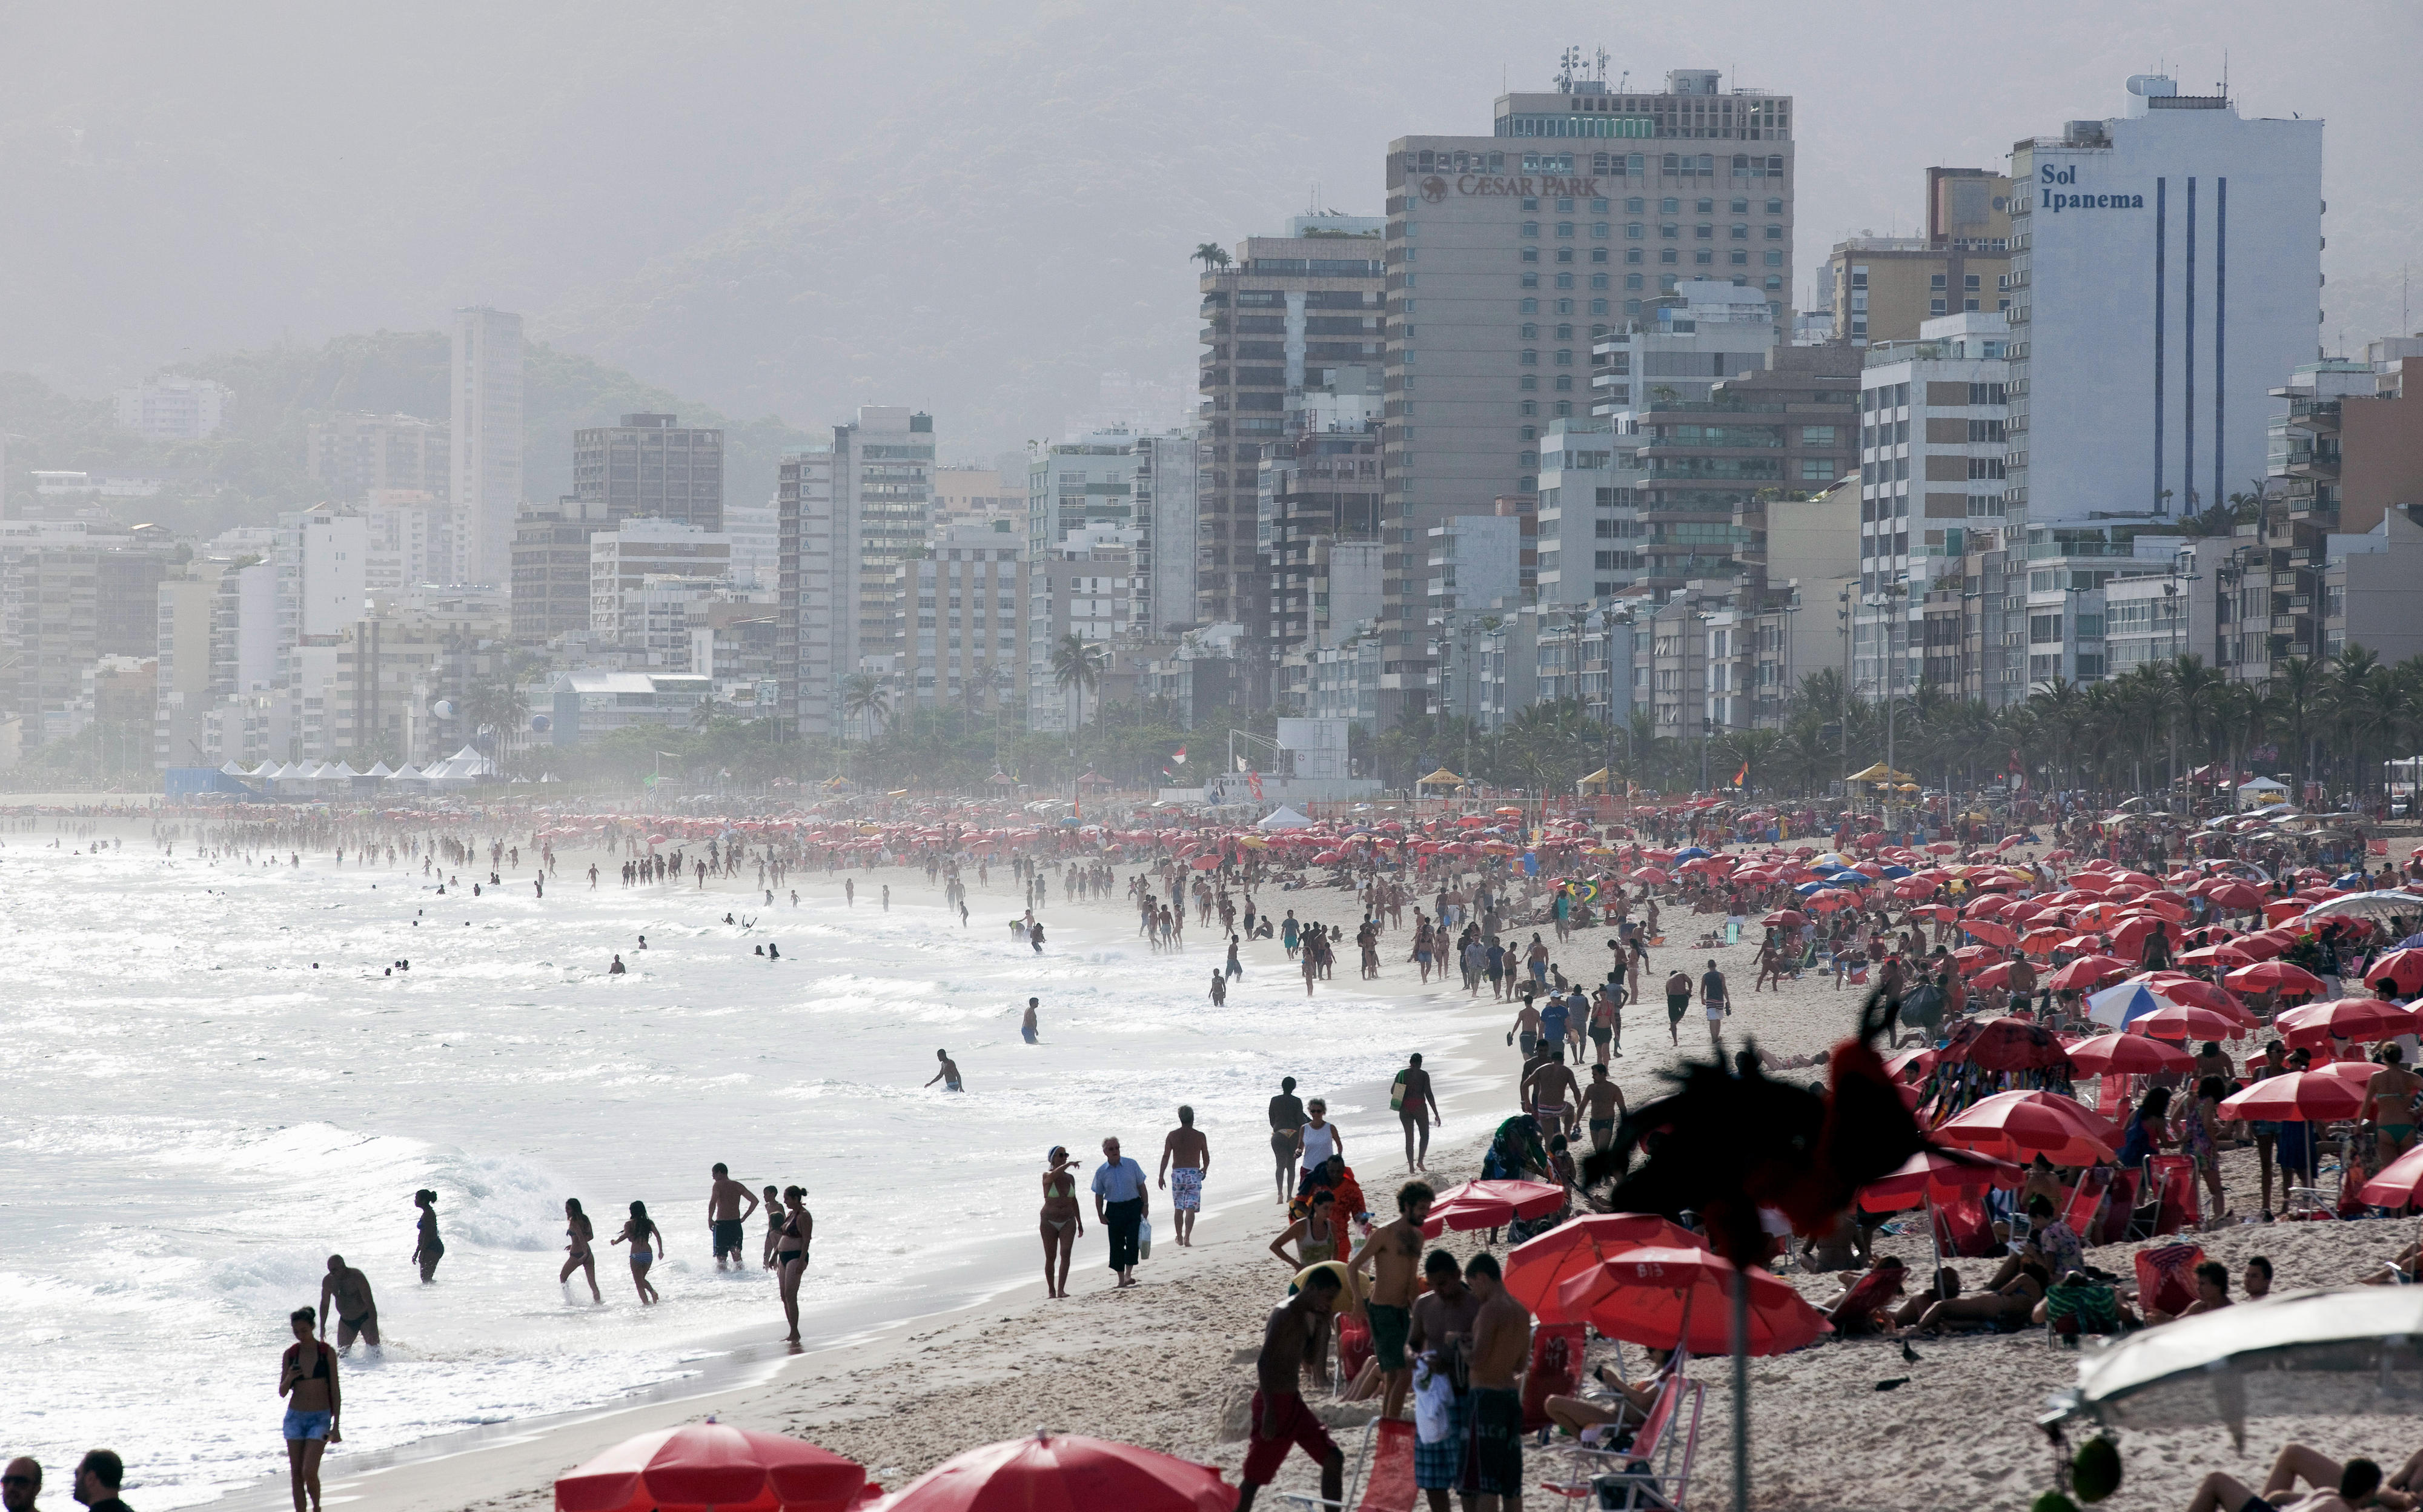 Ipanema-Strand in Rio de Janeiro